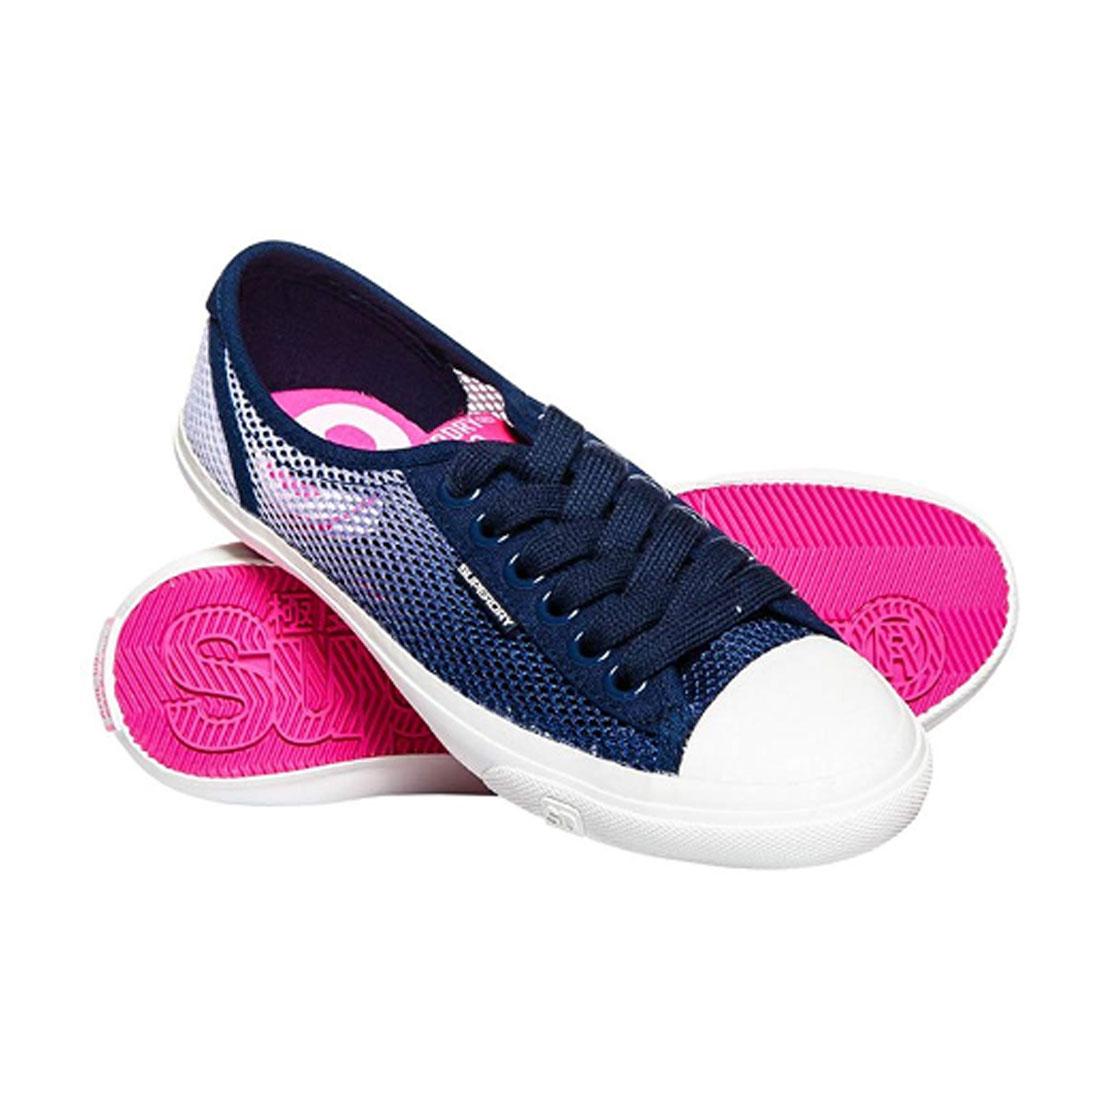 Superdry Damen Sneaker low Pro Mesh Slip On Sommer Schuhe Blau Pink